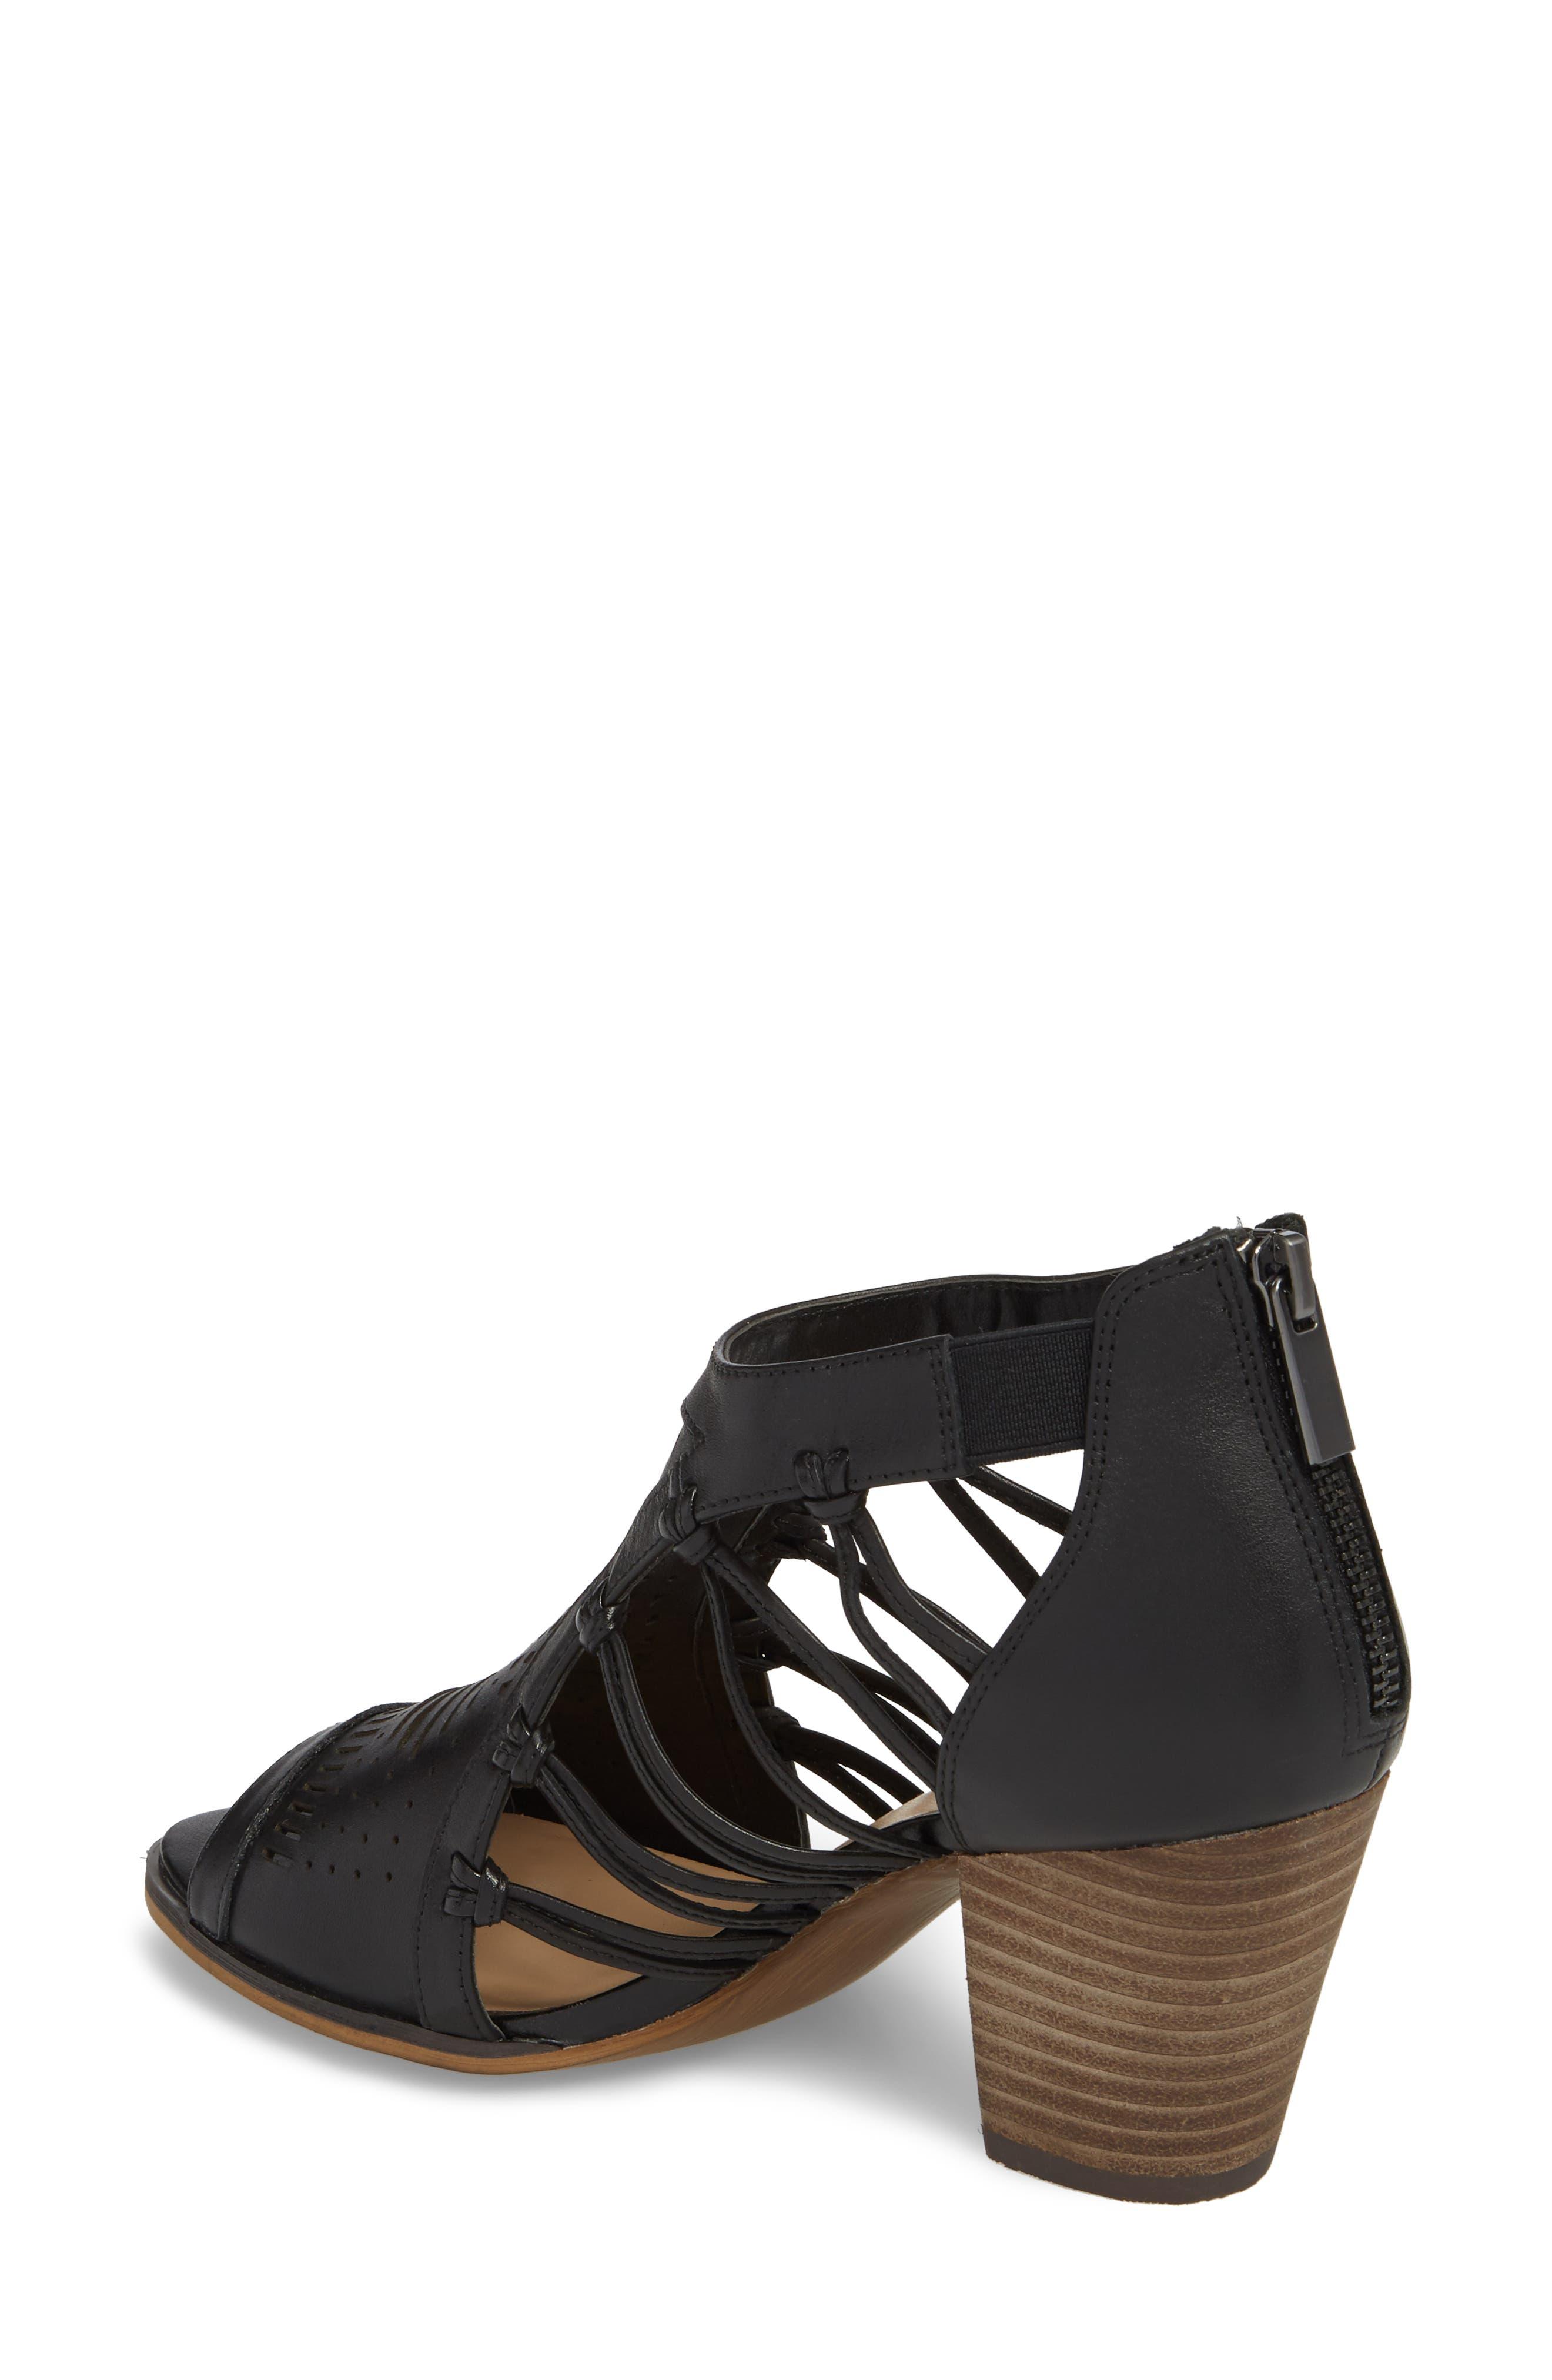 Kortez Block Heel Sandal,                             Alternate thumbnail 2, color,                             BLACK LEATHER